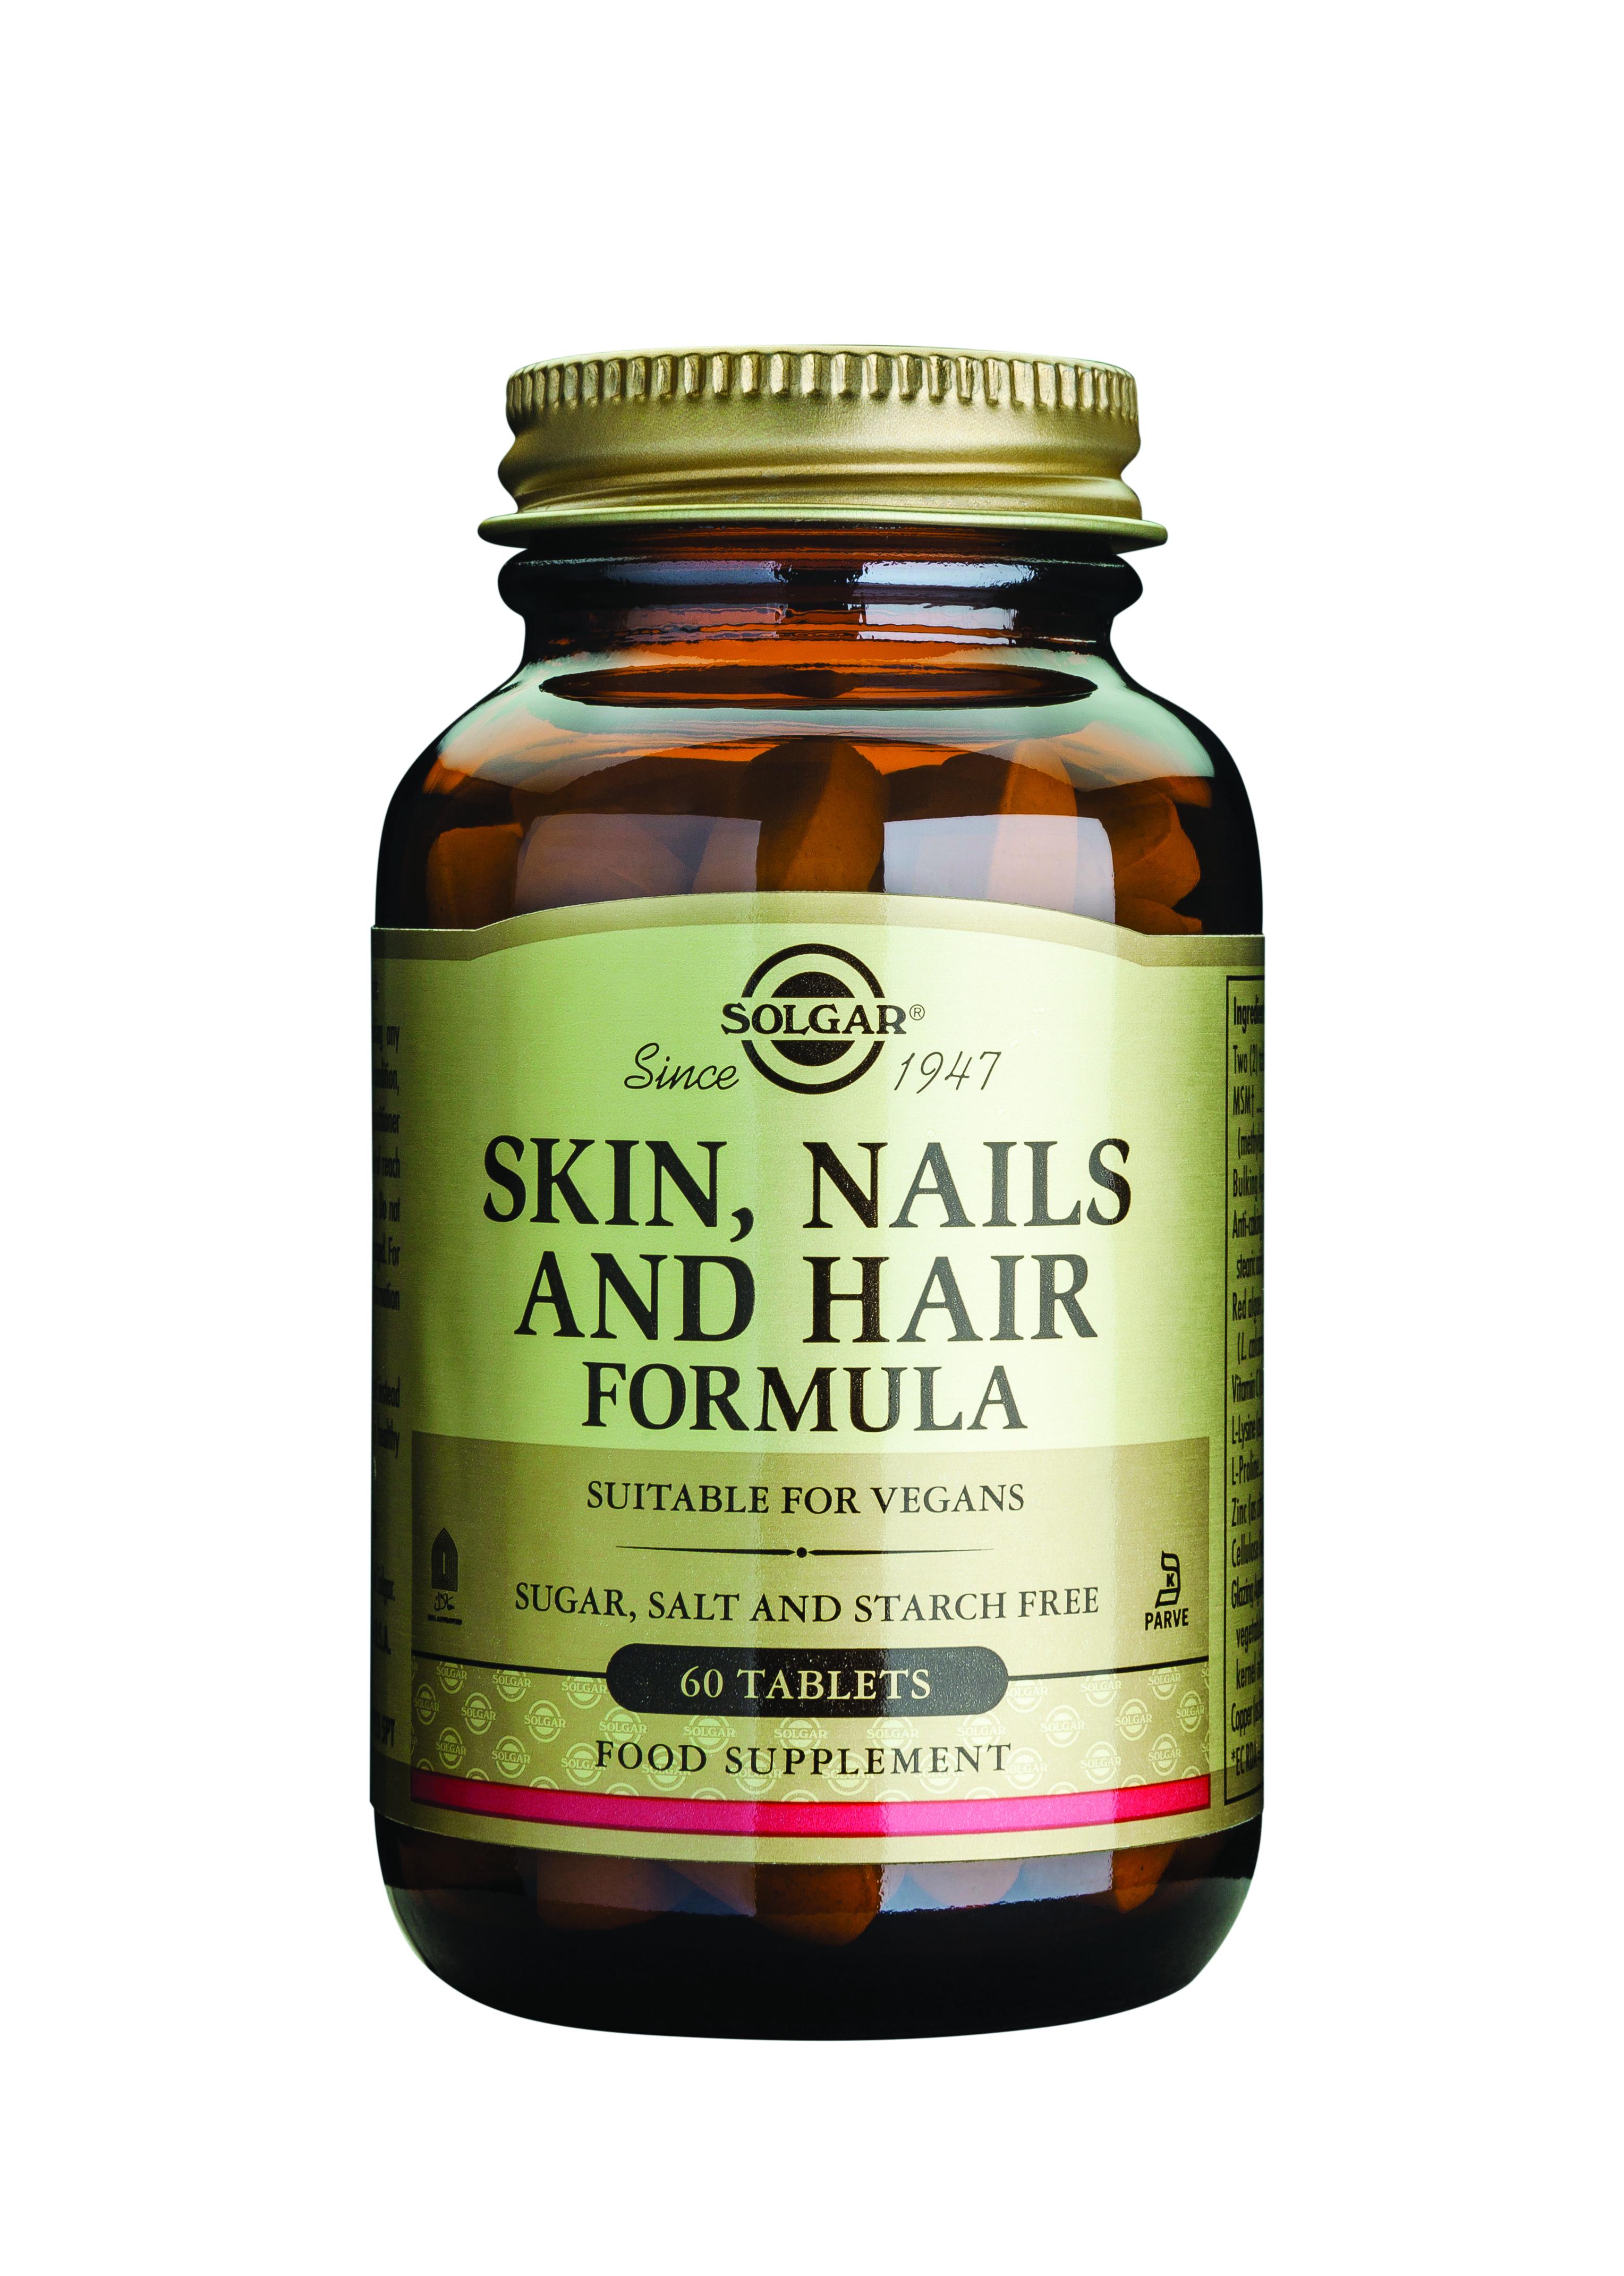 uk_skin_nails_hair_60_tablets_1735_pic-aha